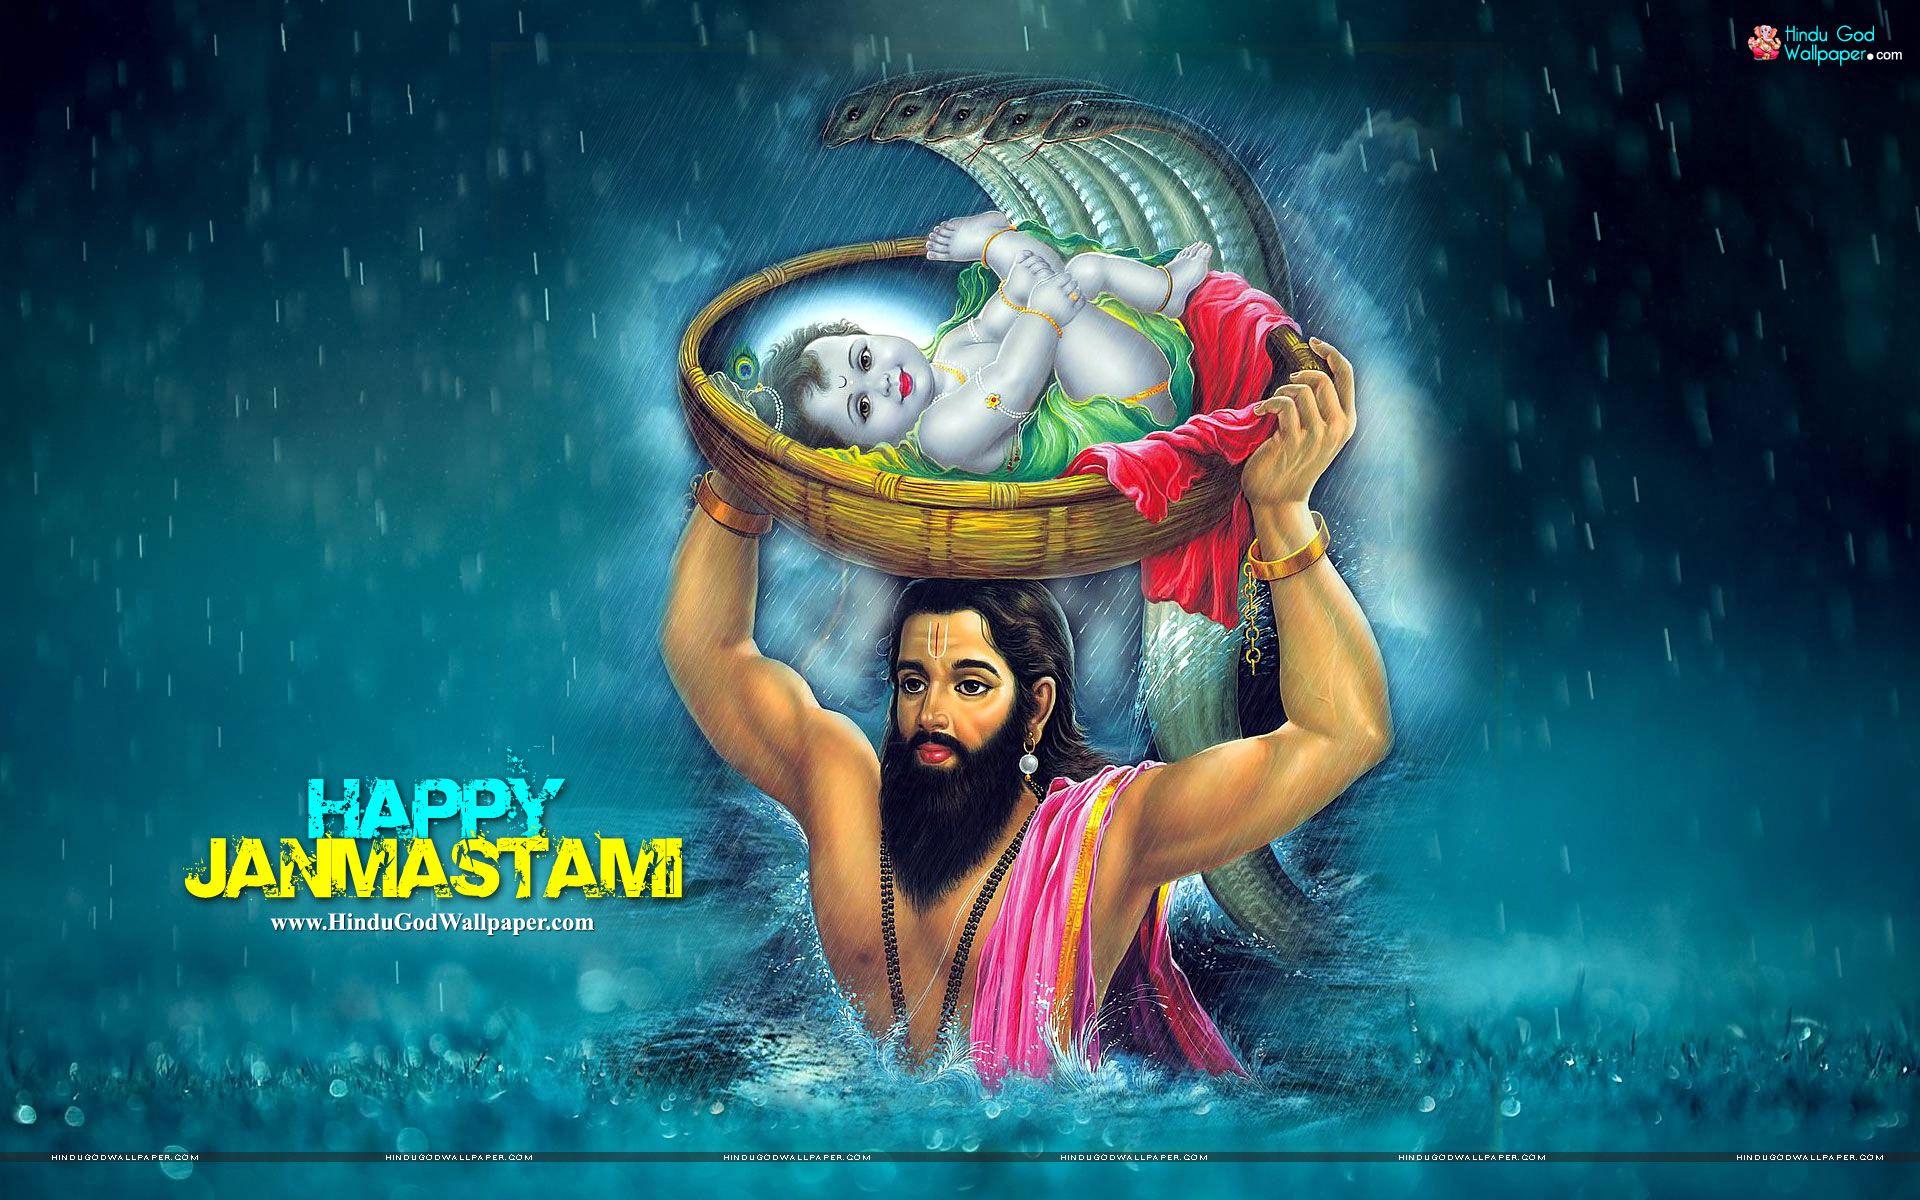 Free Download Krishna Janmashtami Wallpapers For Desktop And Hd Full Size Happy Janmashtami Festiv Happy Janmashtami Image Happy Janmashtami Janmashtami Wishes